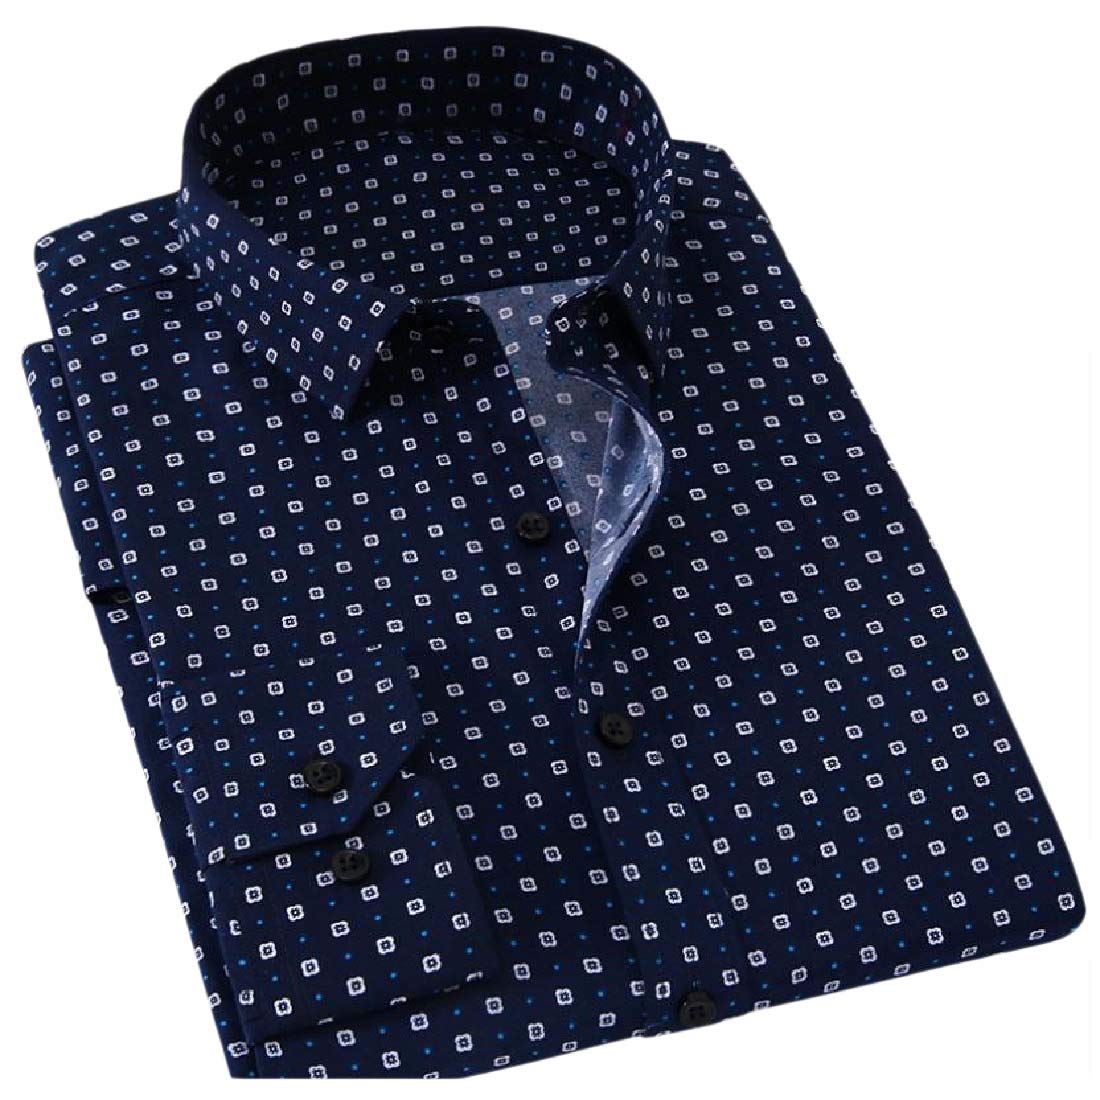 YUNY Mens Vogue Slim Buttoned Thin Floral Print Long Sleeve Shirt 2 2XL